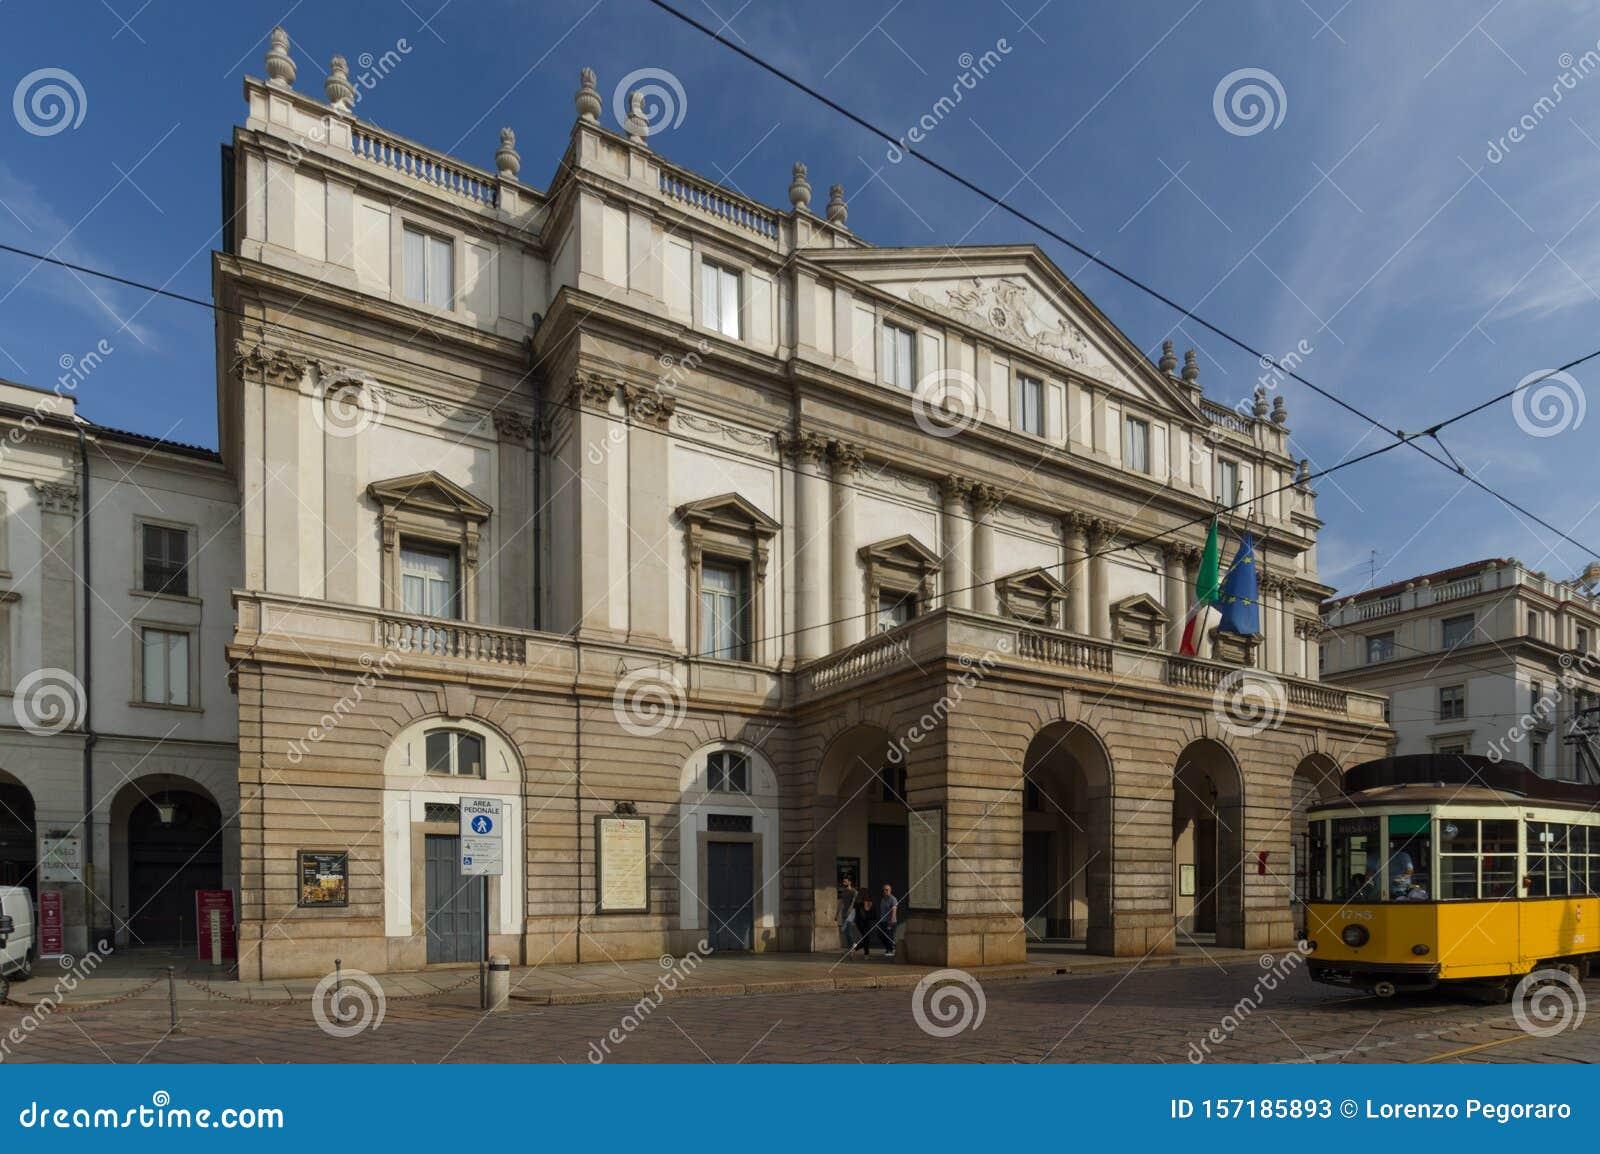 531 Opera Milano Photos - Free & Royalty-Free Stock Photos from Dreamstime